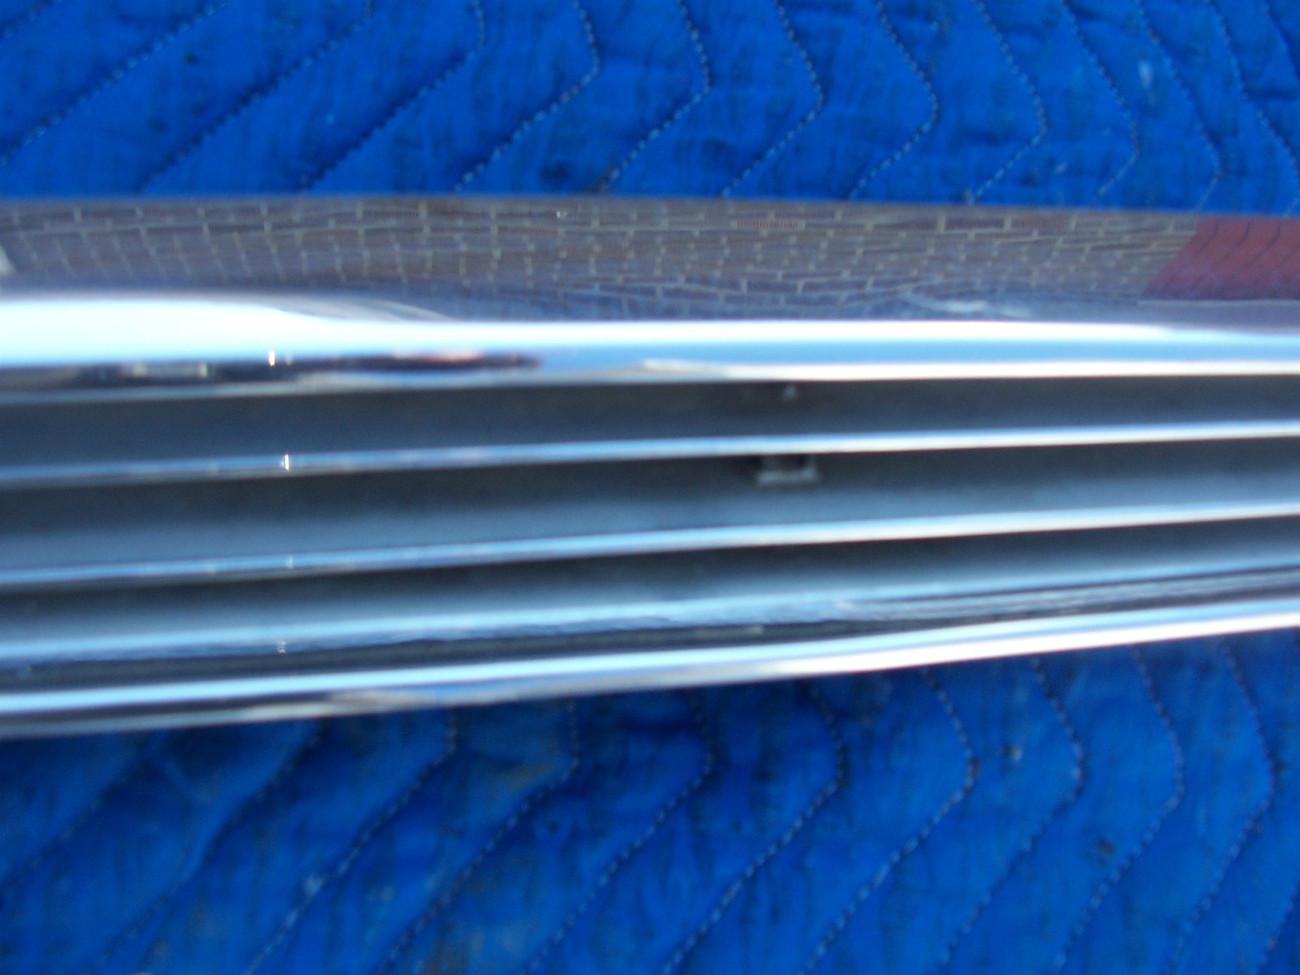 1964 1965 THUNDERBIRD REAR WINDOW GRILL OEM USED ORIGINAL FORD PART